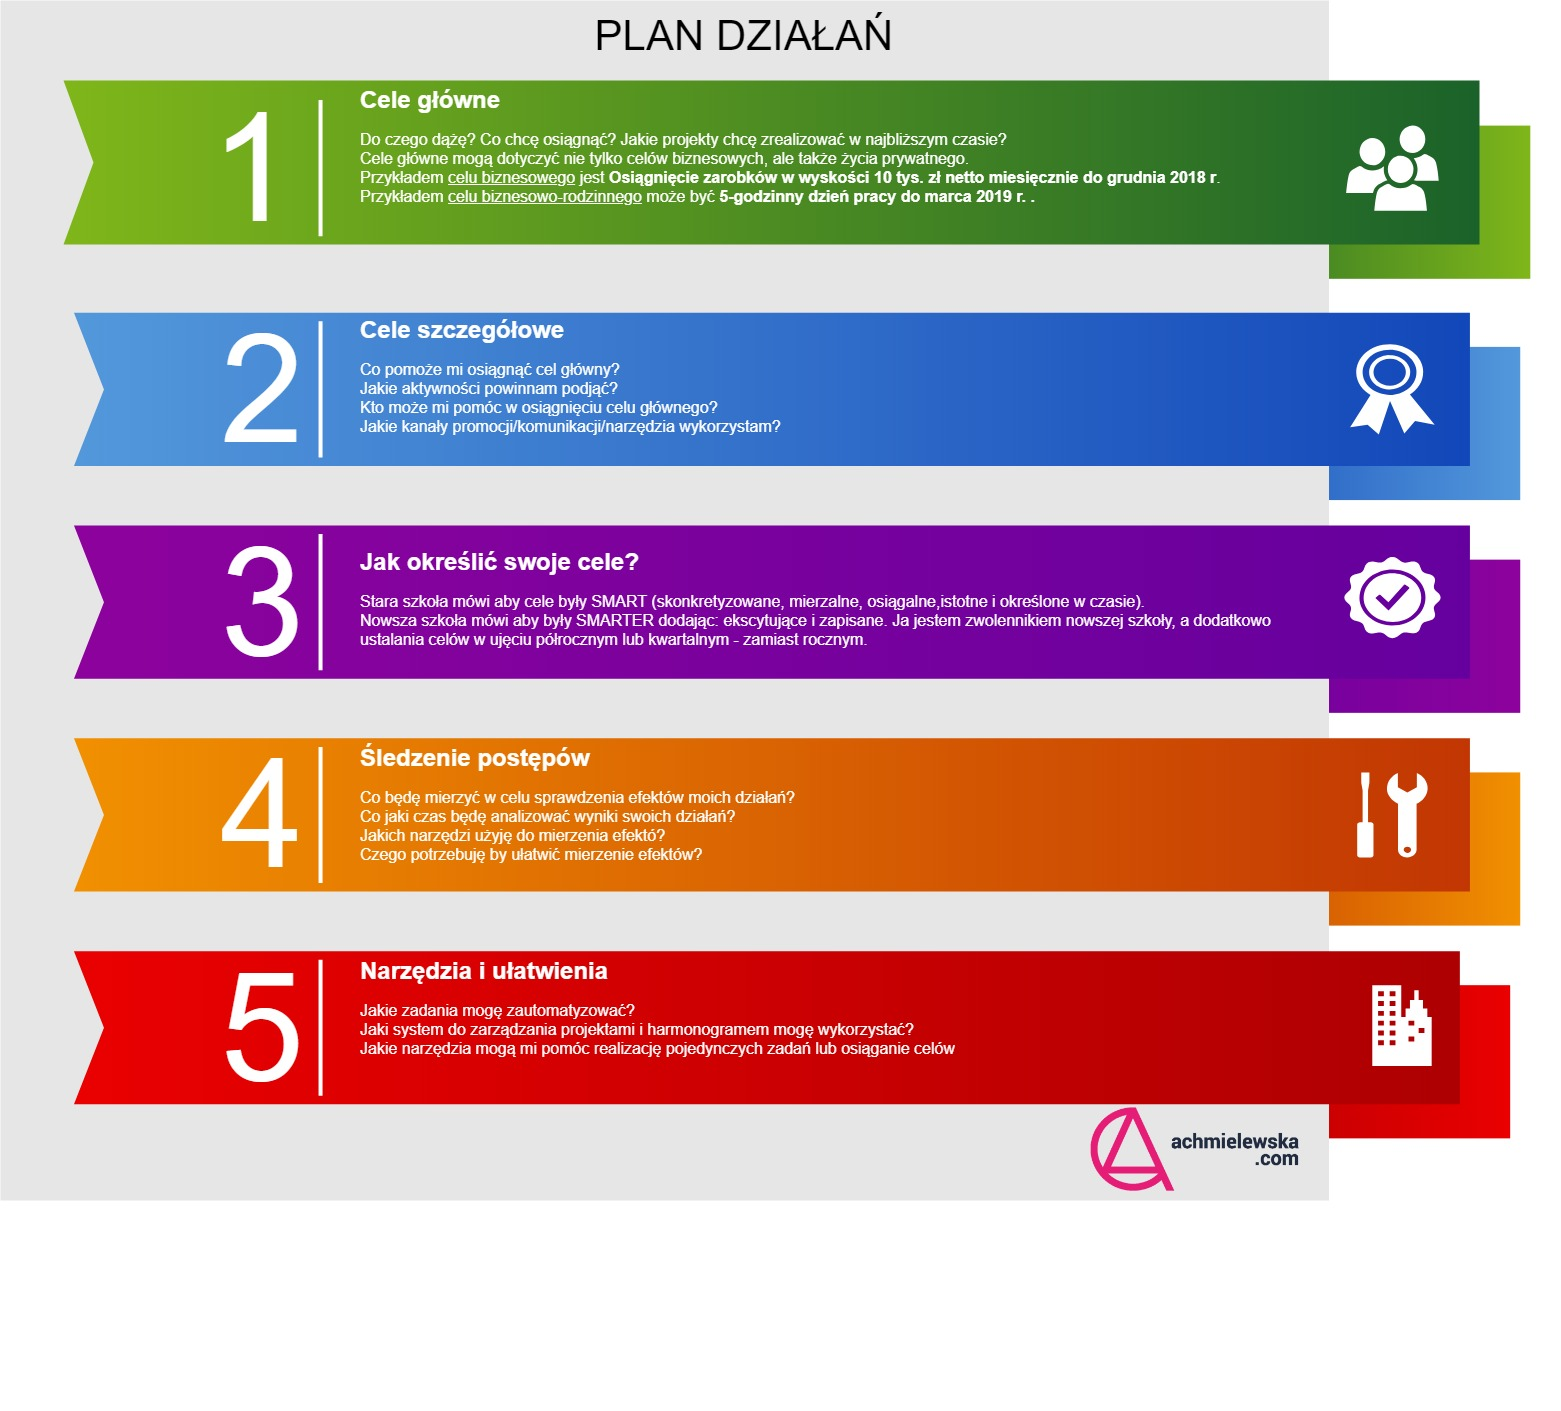 Plan działań pomocnik-Pomocnik